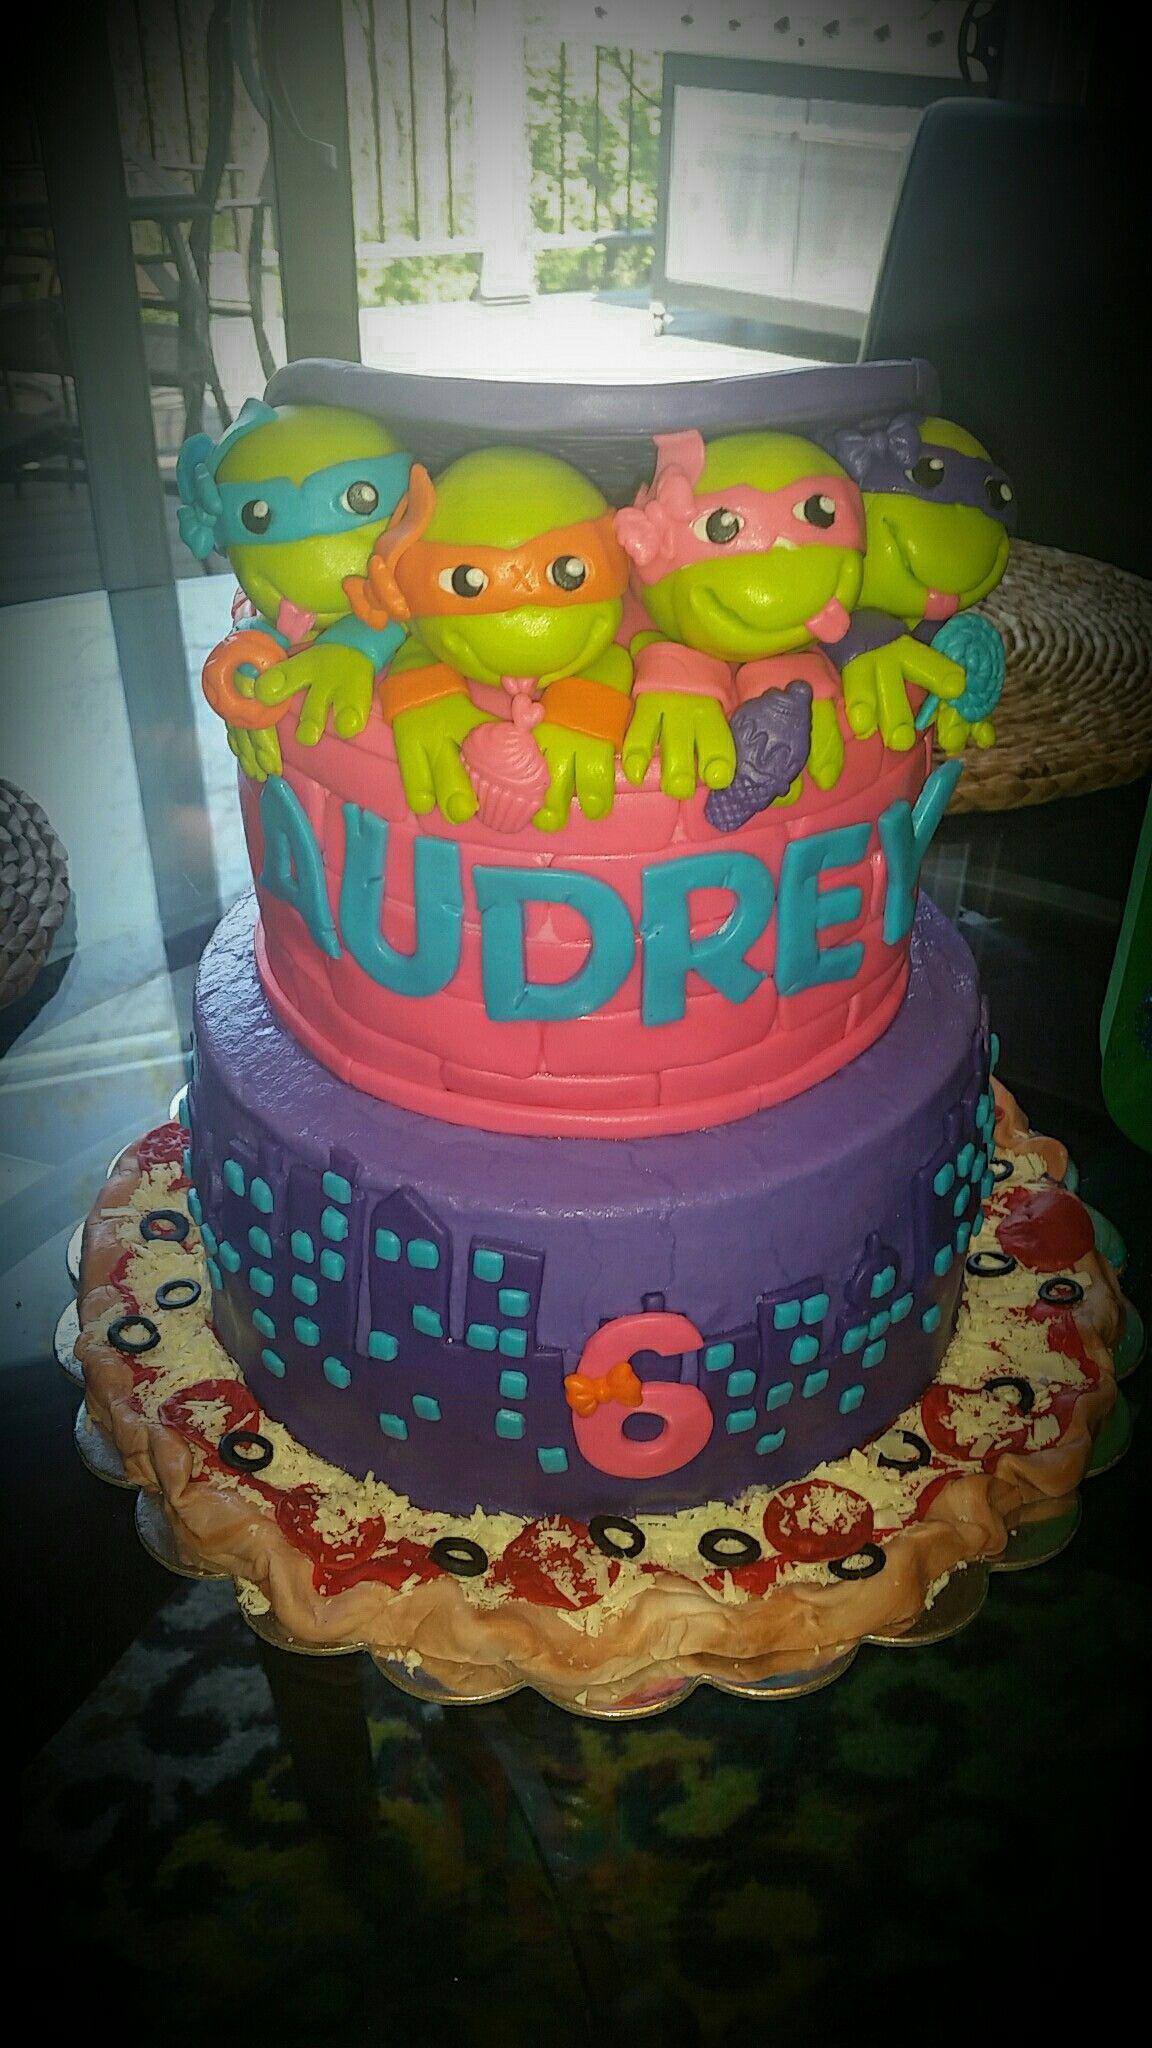 Teenage Mutant Ninja Turtle Inspired Cake For Girl Busy Bs Cakes